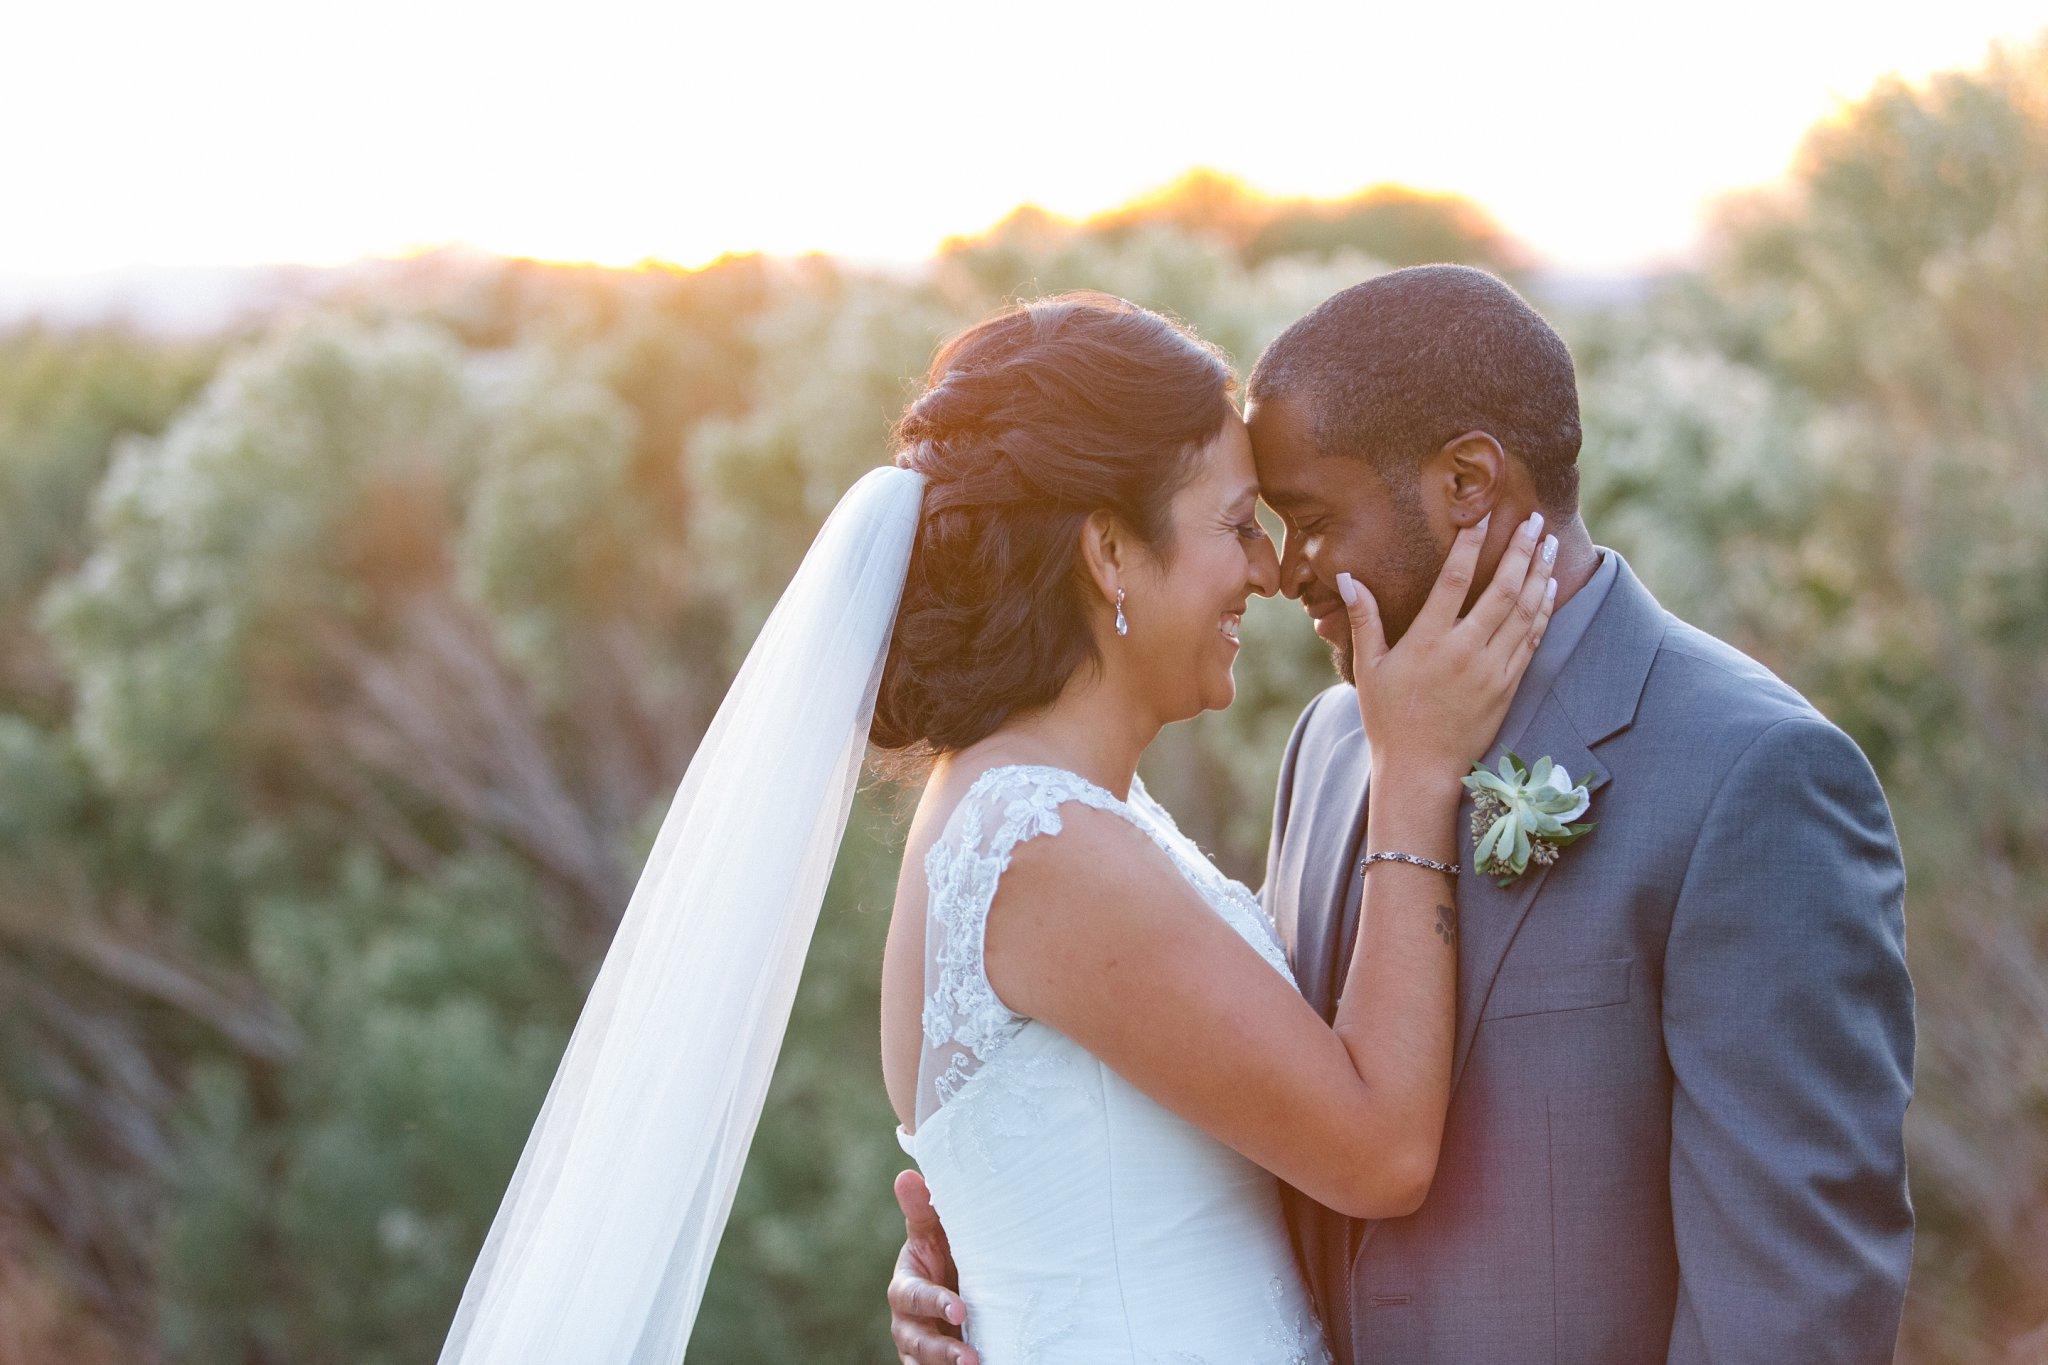 natural authentic emotional portraits of bride & groom Arizona wedding photographer